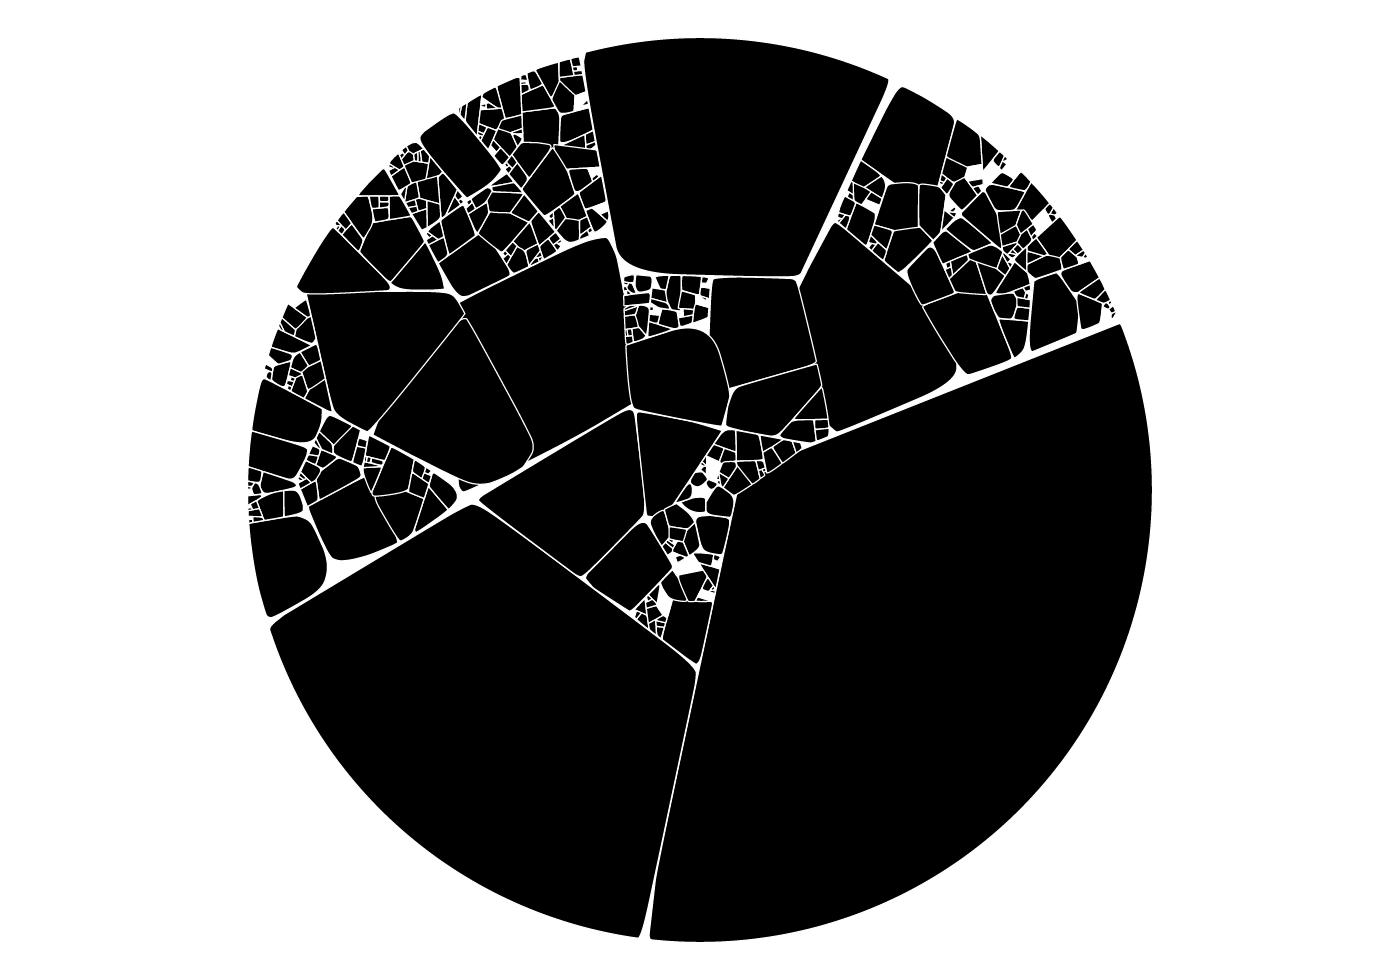 programming  algorithmic code generative algorithm 2D svg Fracture glass